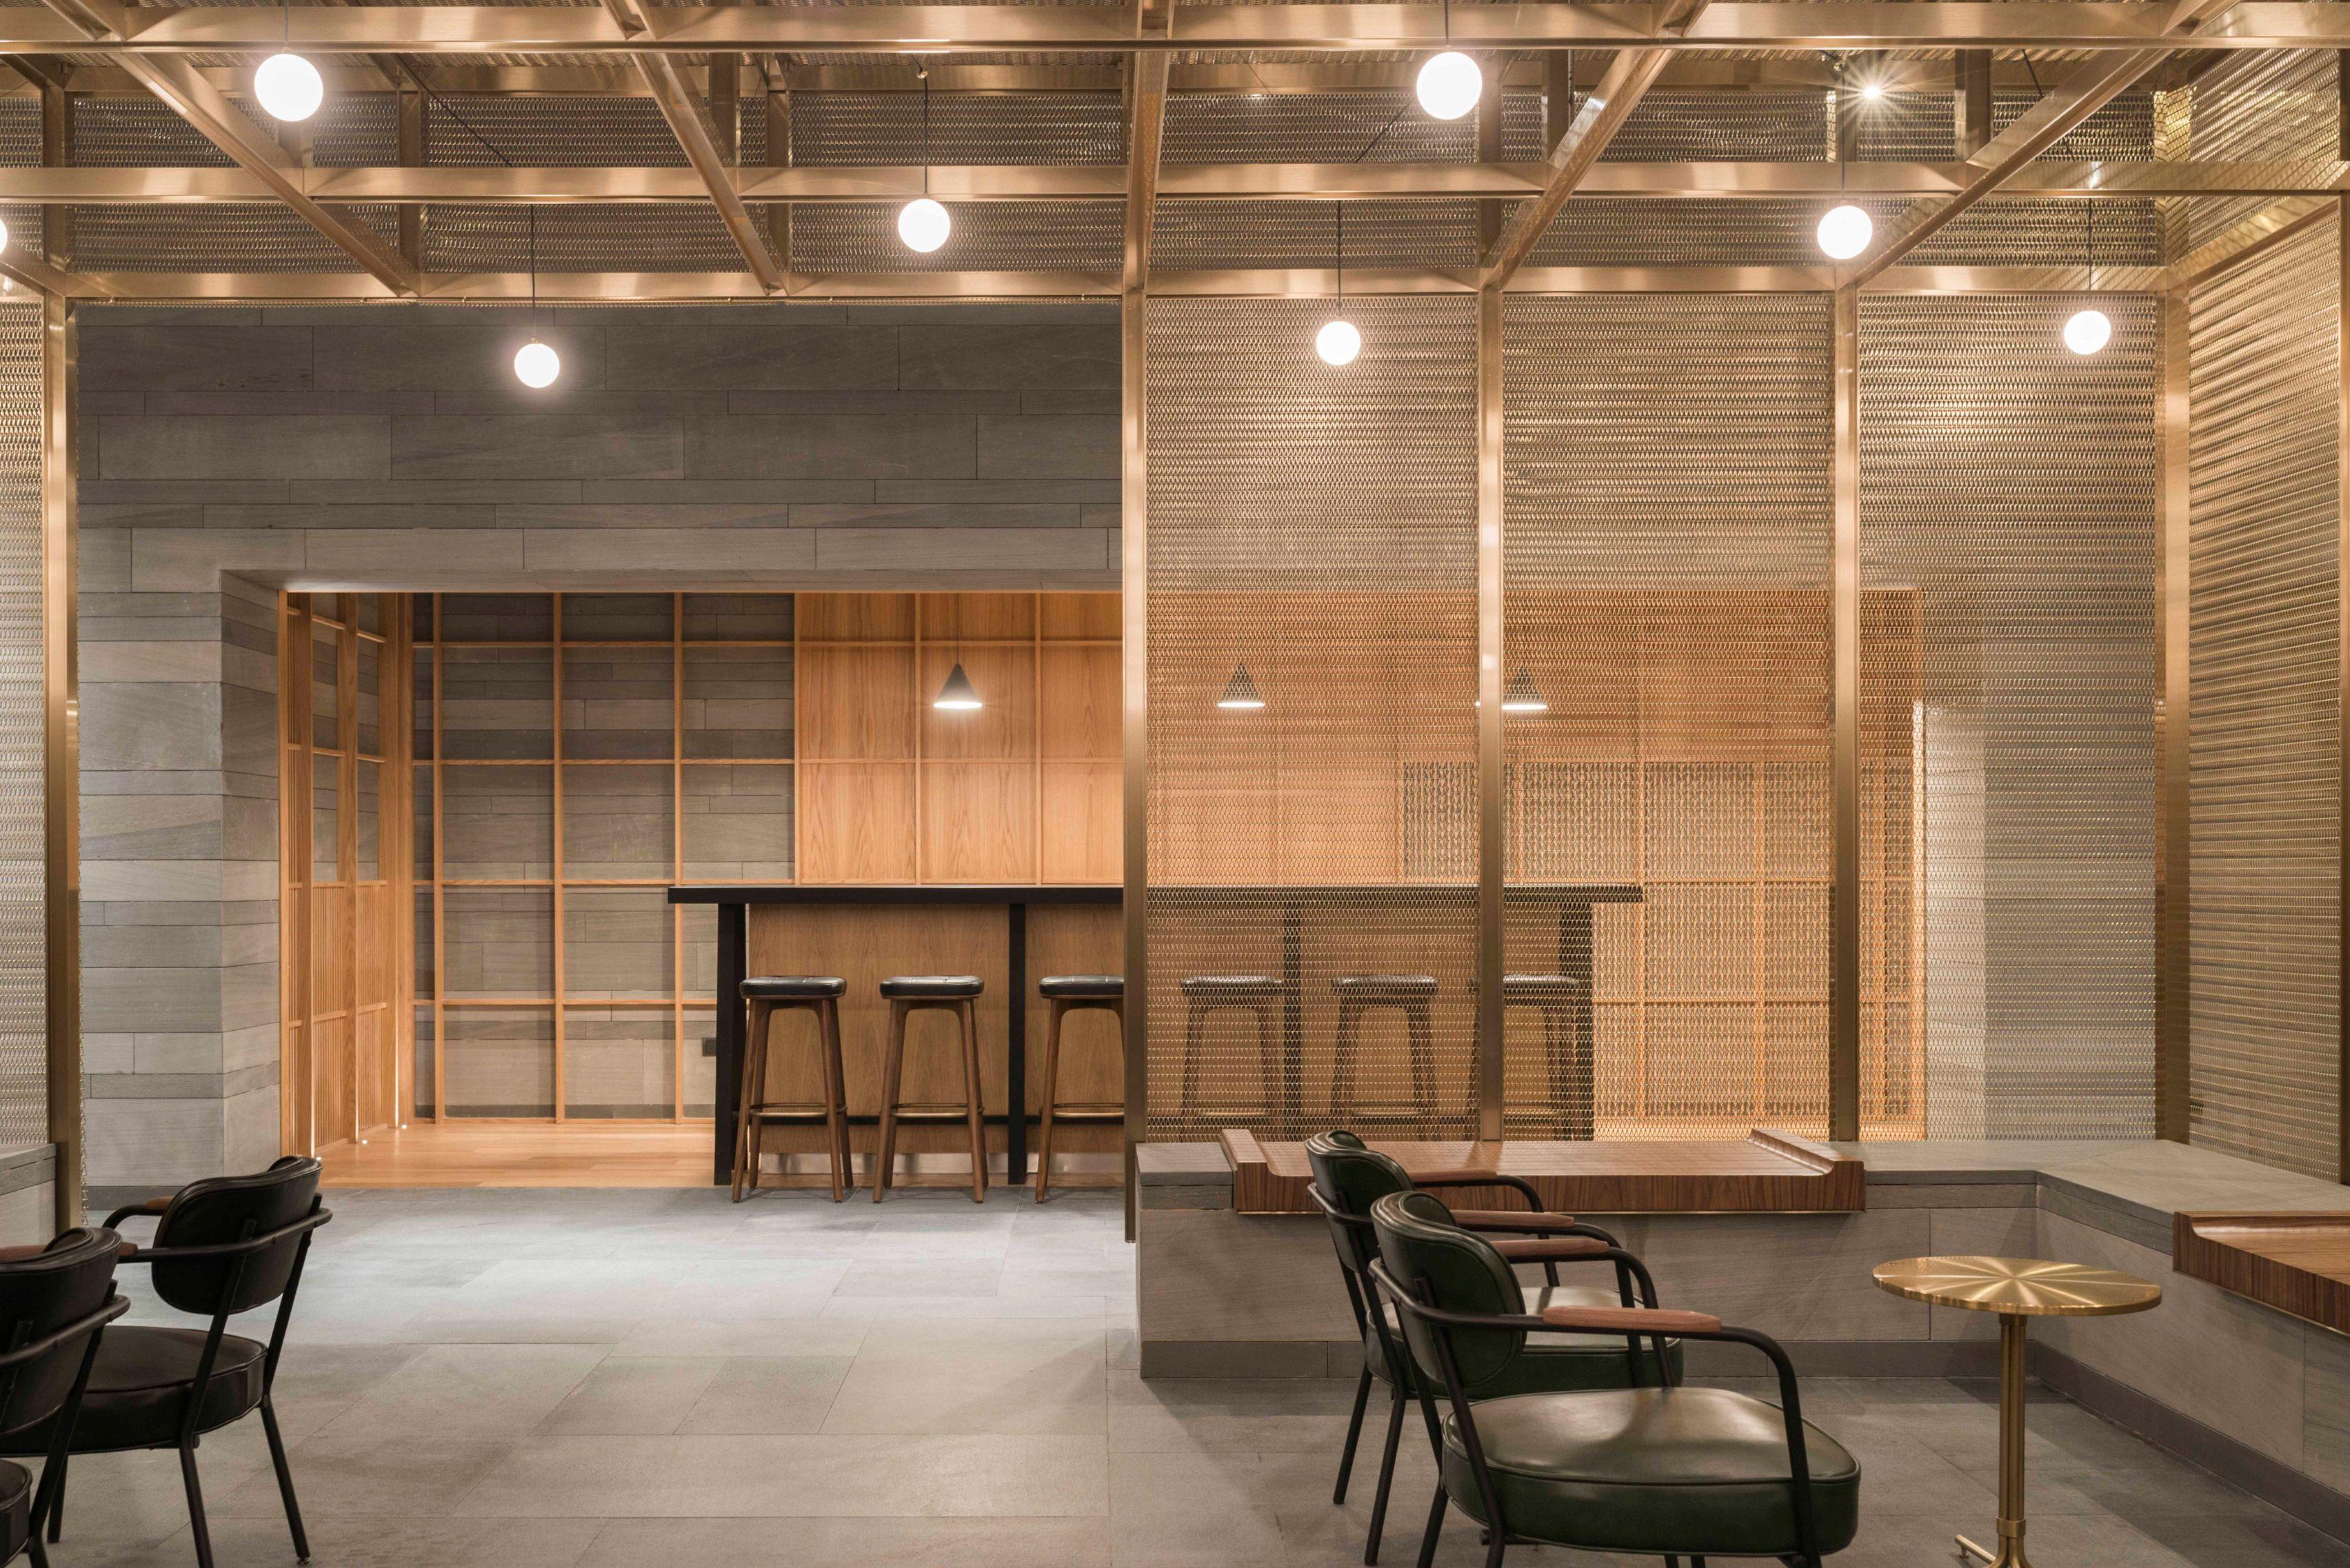 neri&hu has used wood-covered sticks and sandstone slabs to create